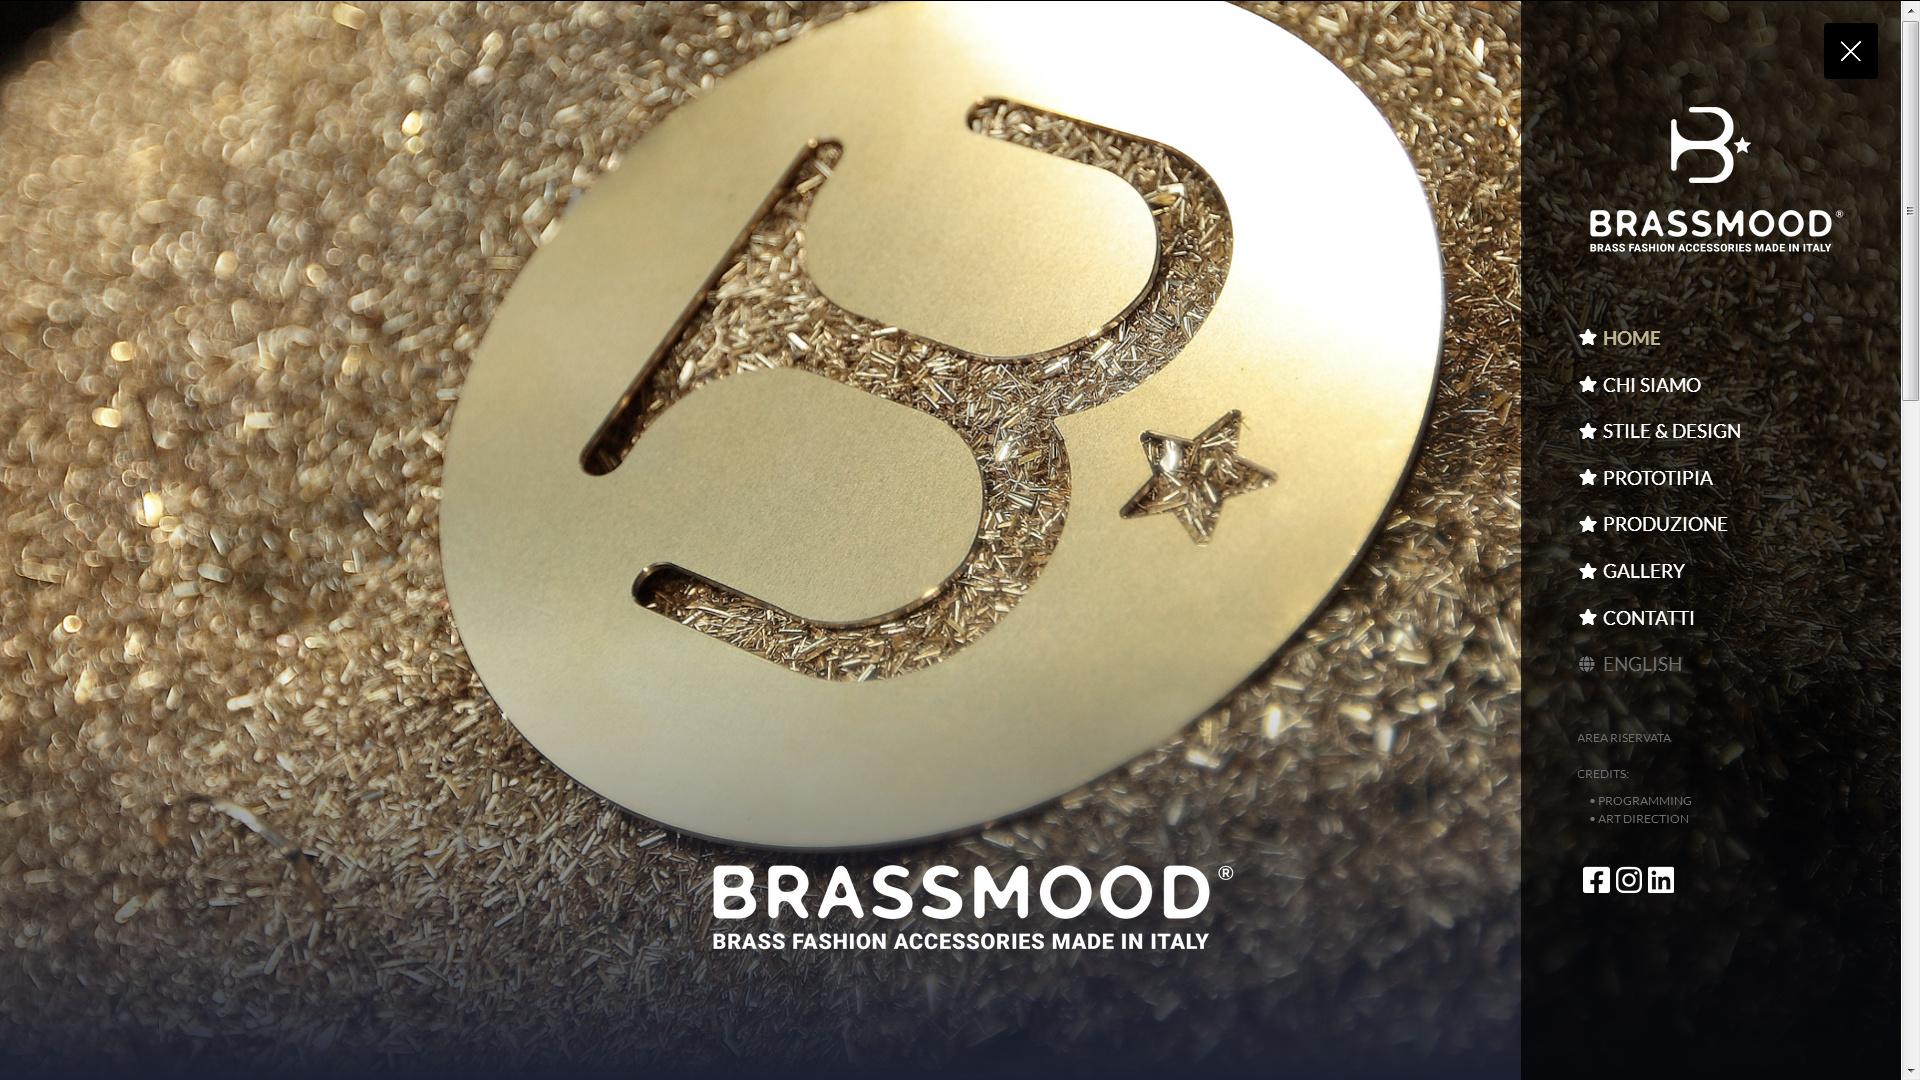 Brassmood